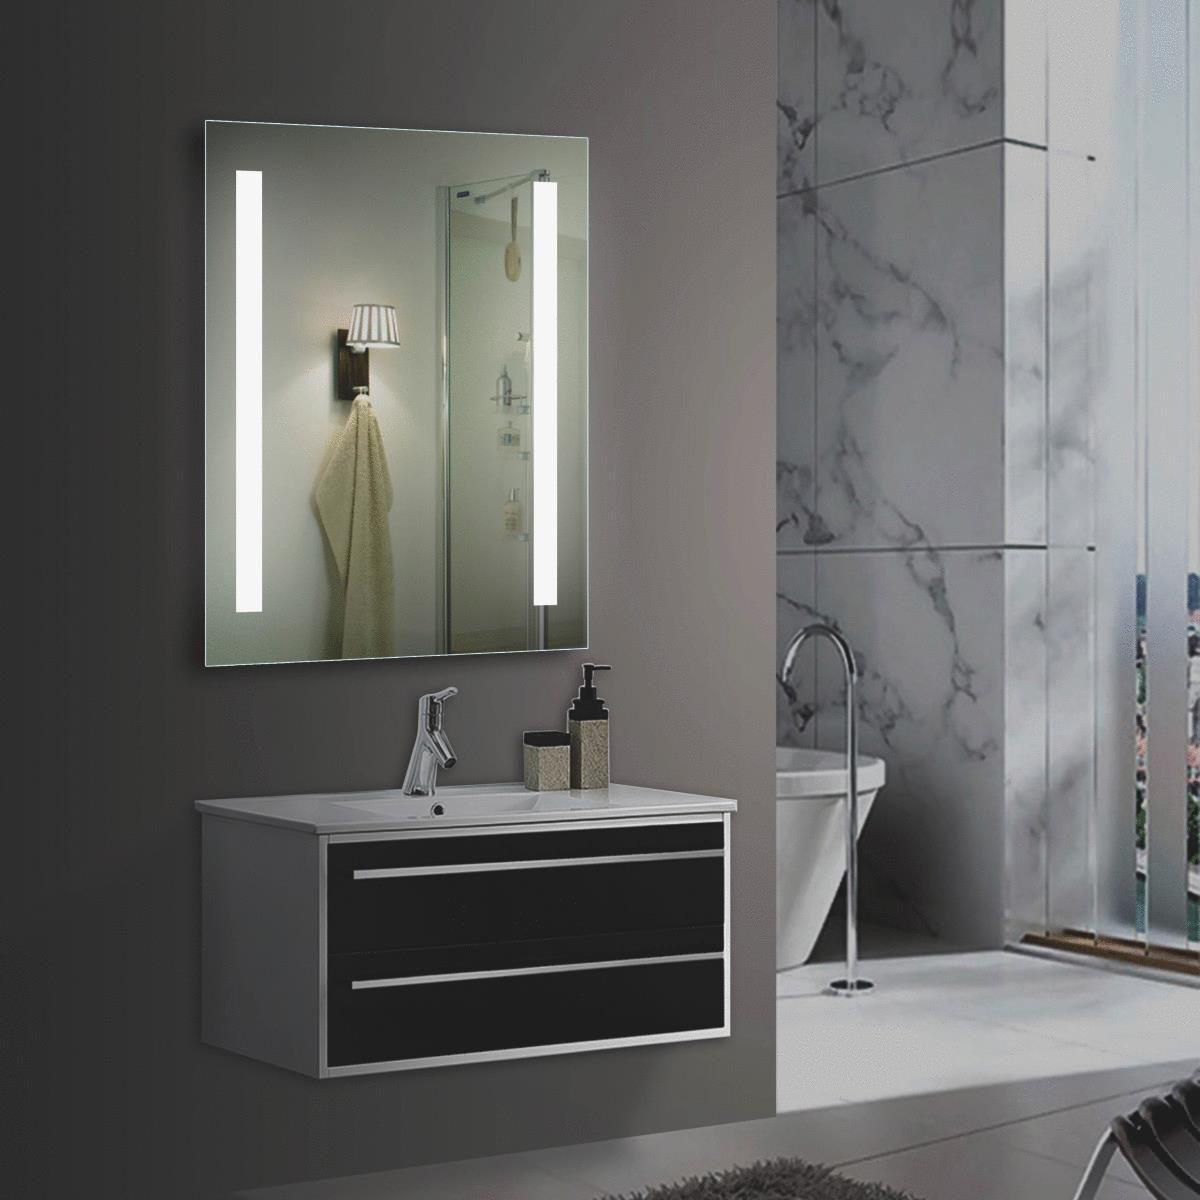 Lighted Impressions Maxx Vanity Mirror Maxx